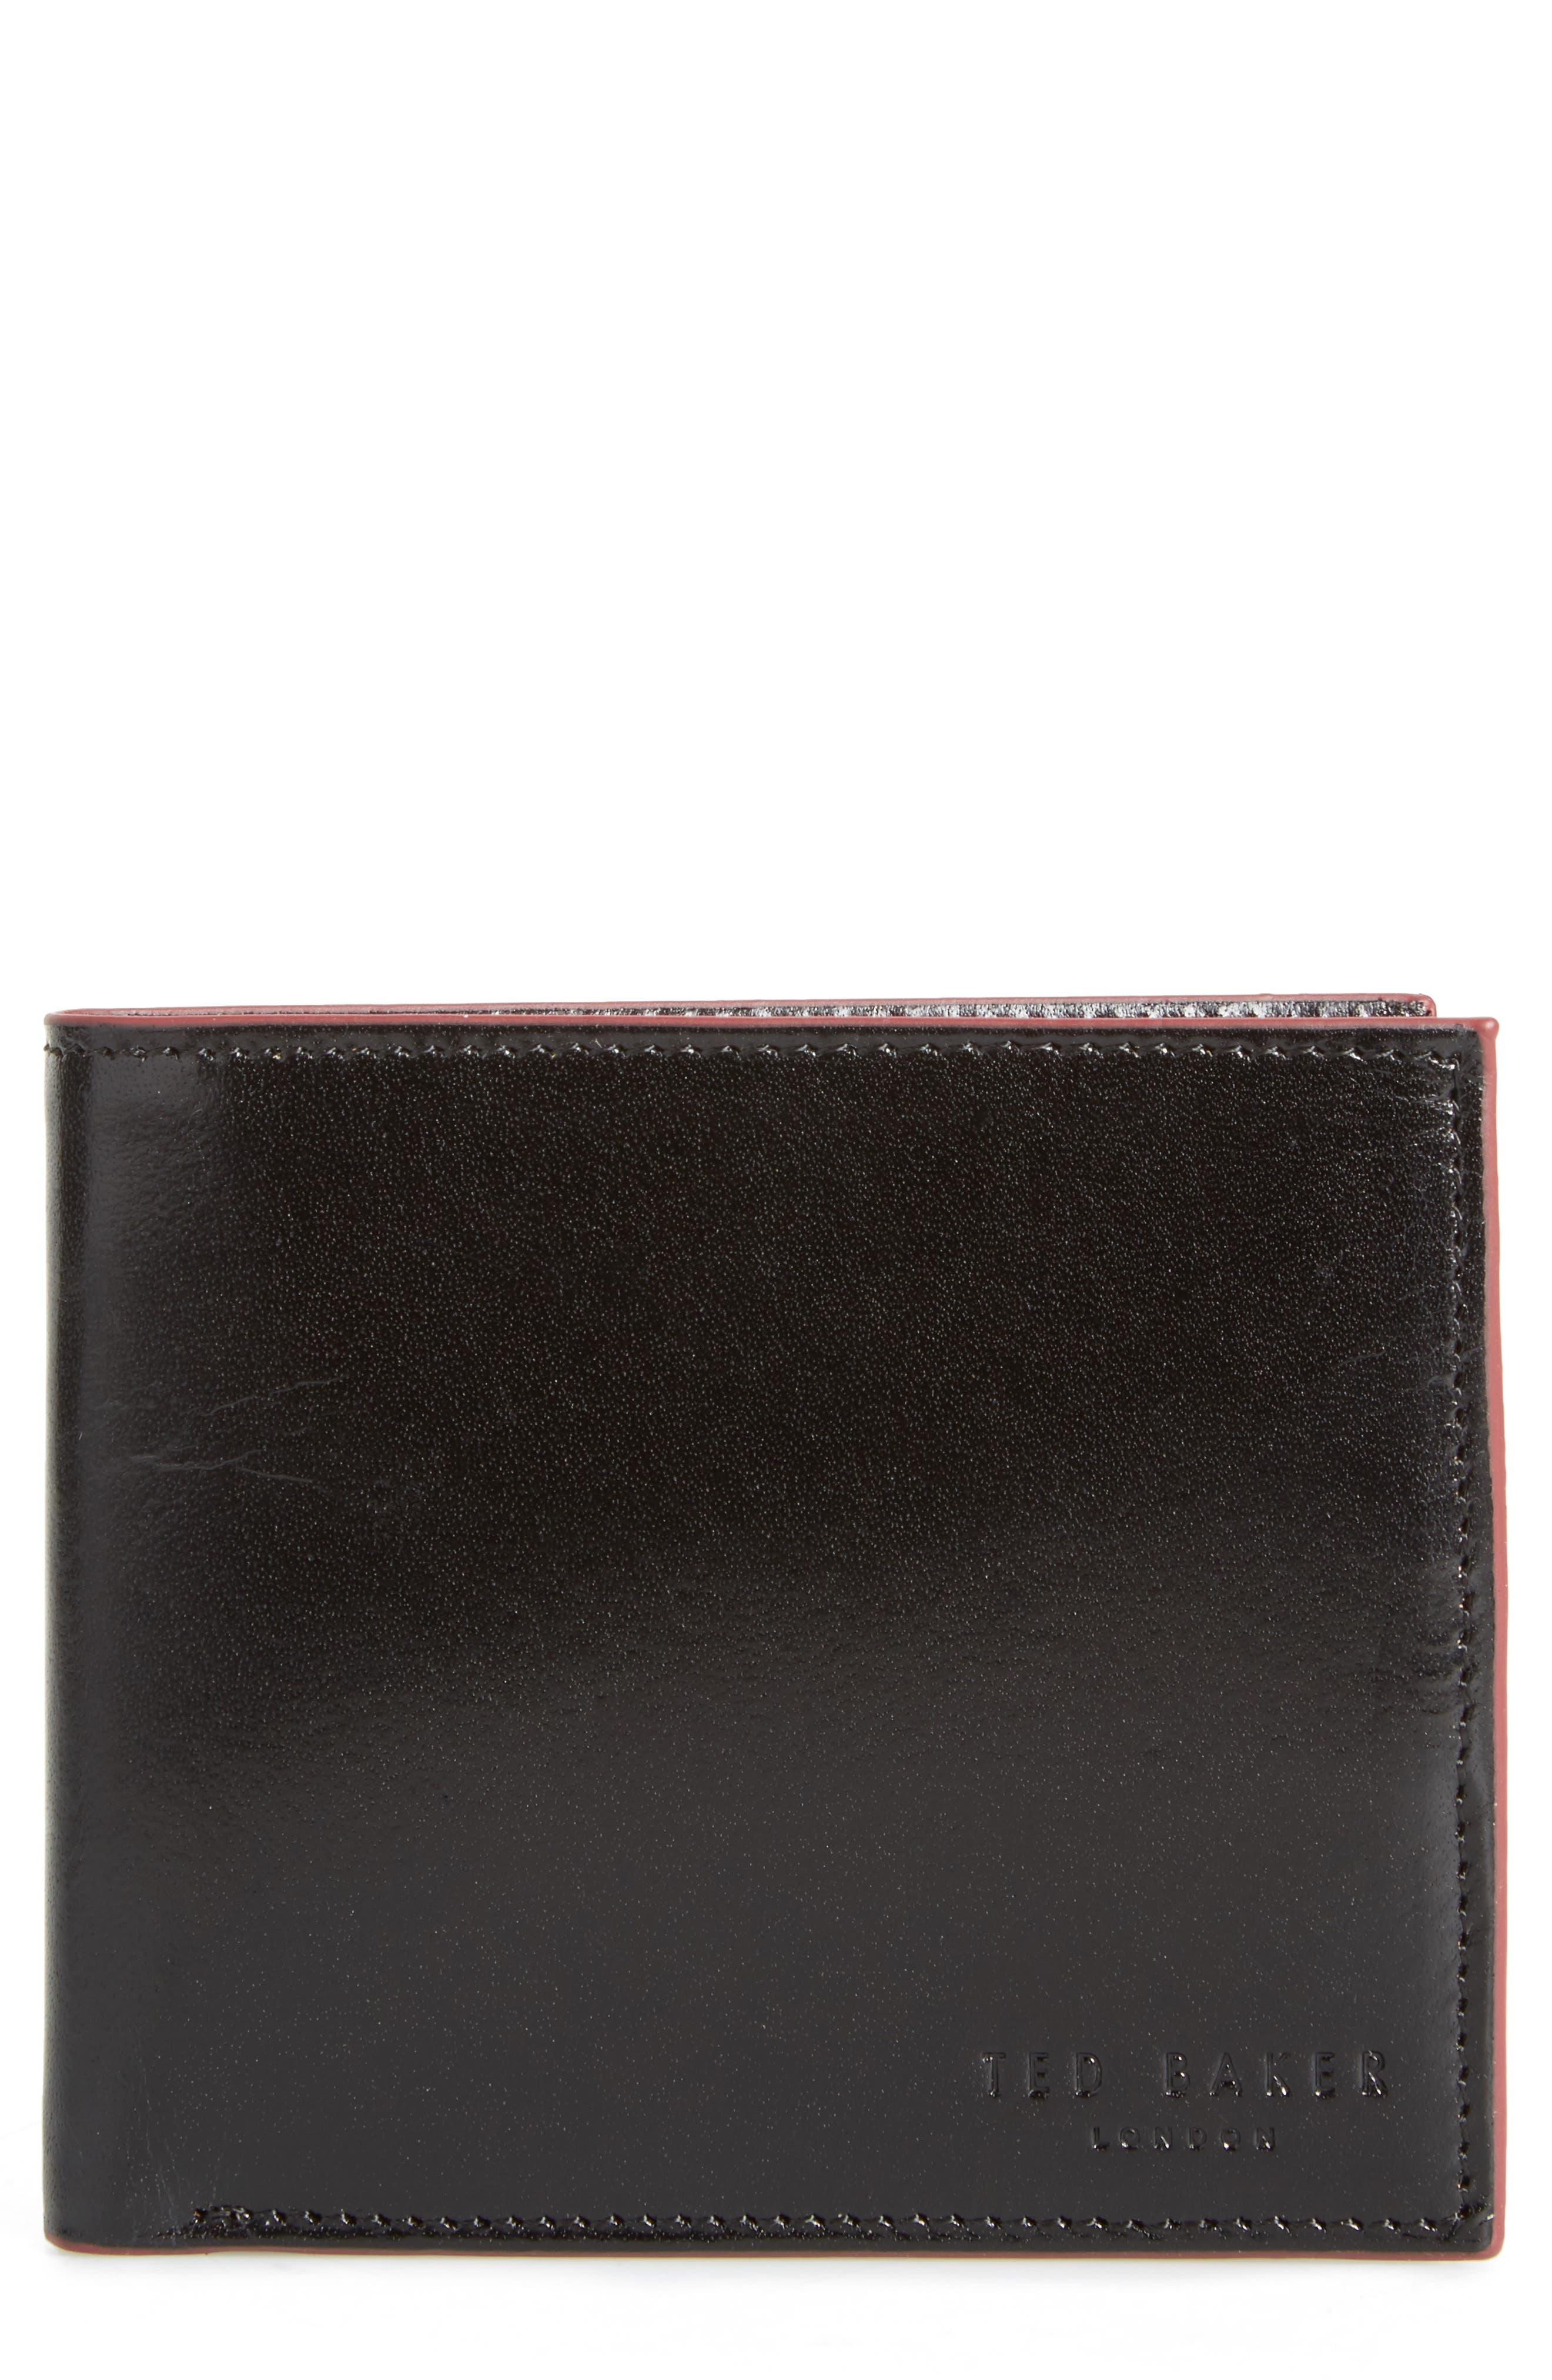 Loganz Leather Wallet,                             Main thumbnail 1, color,                             001